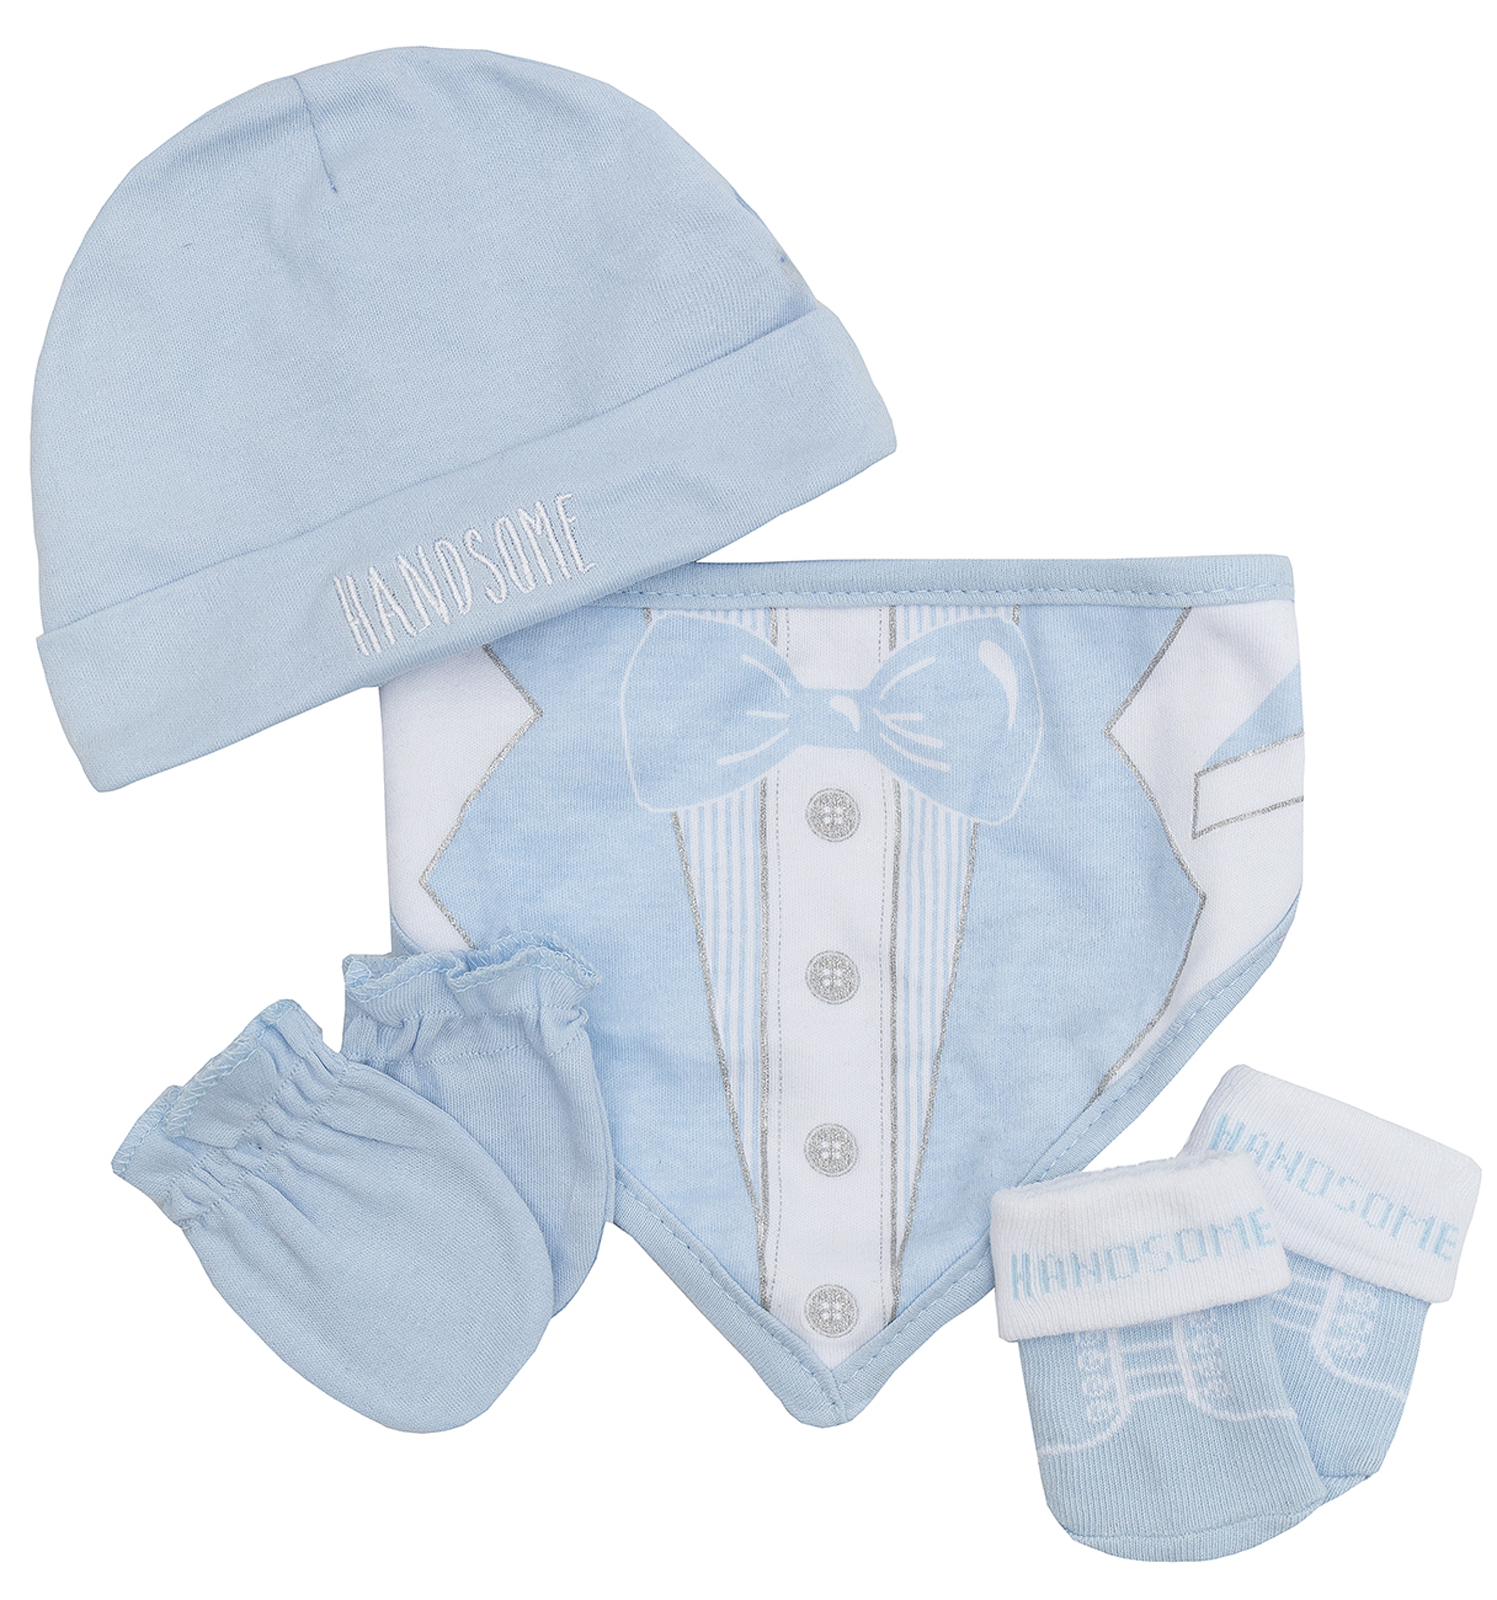 Baby Boys Girls 4 Piece Gift Set Bib Socks Booties Mittens Hat Cute